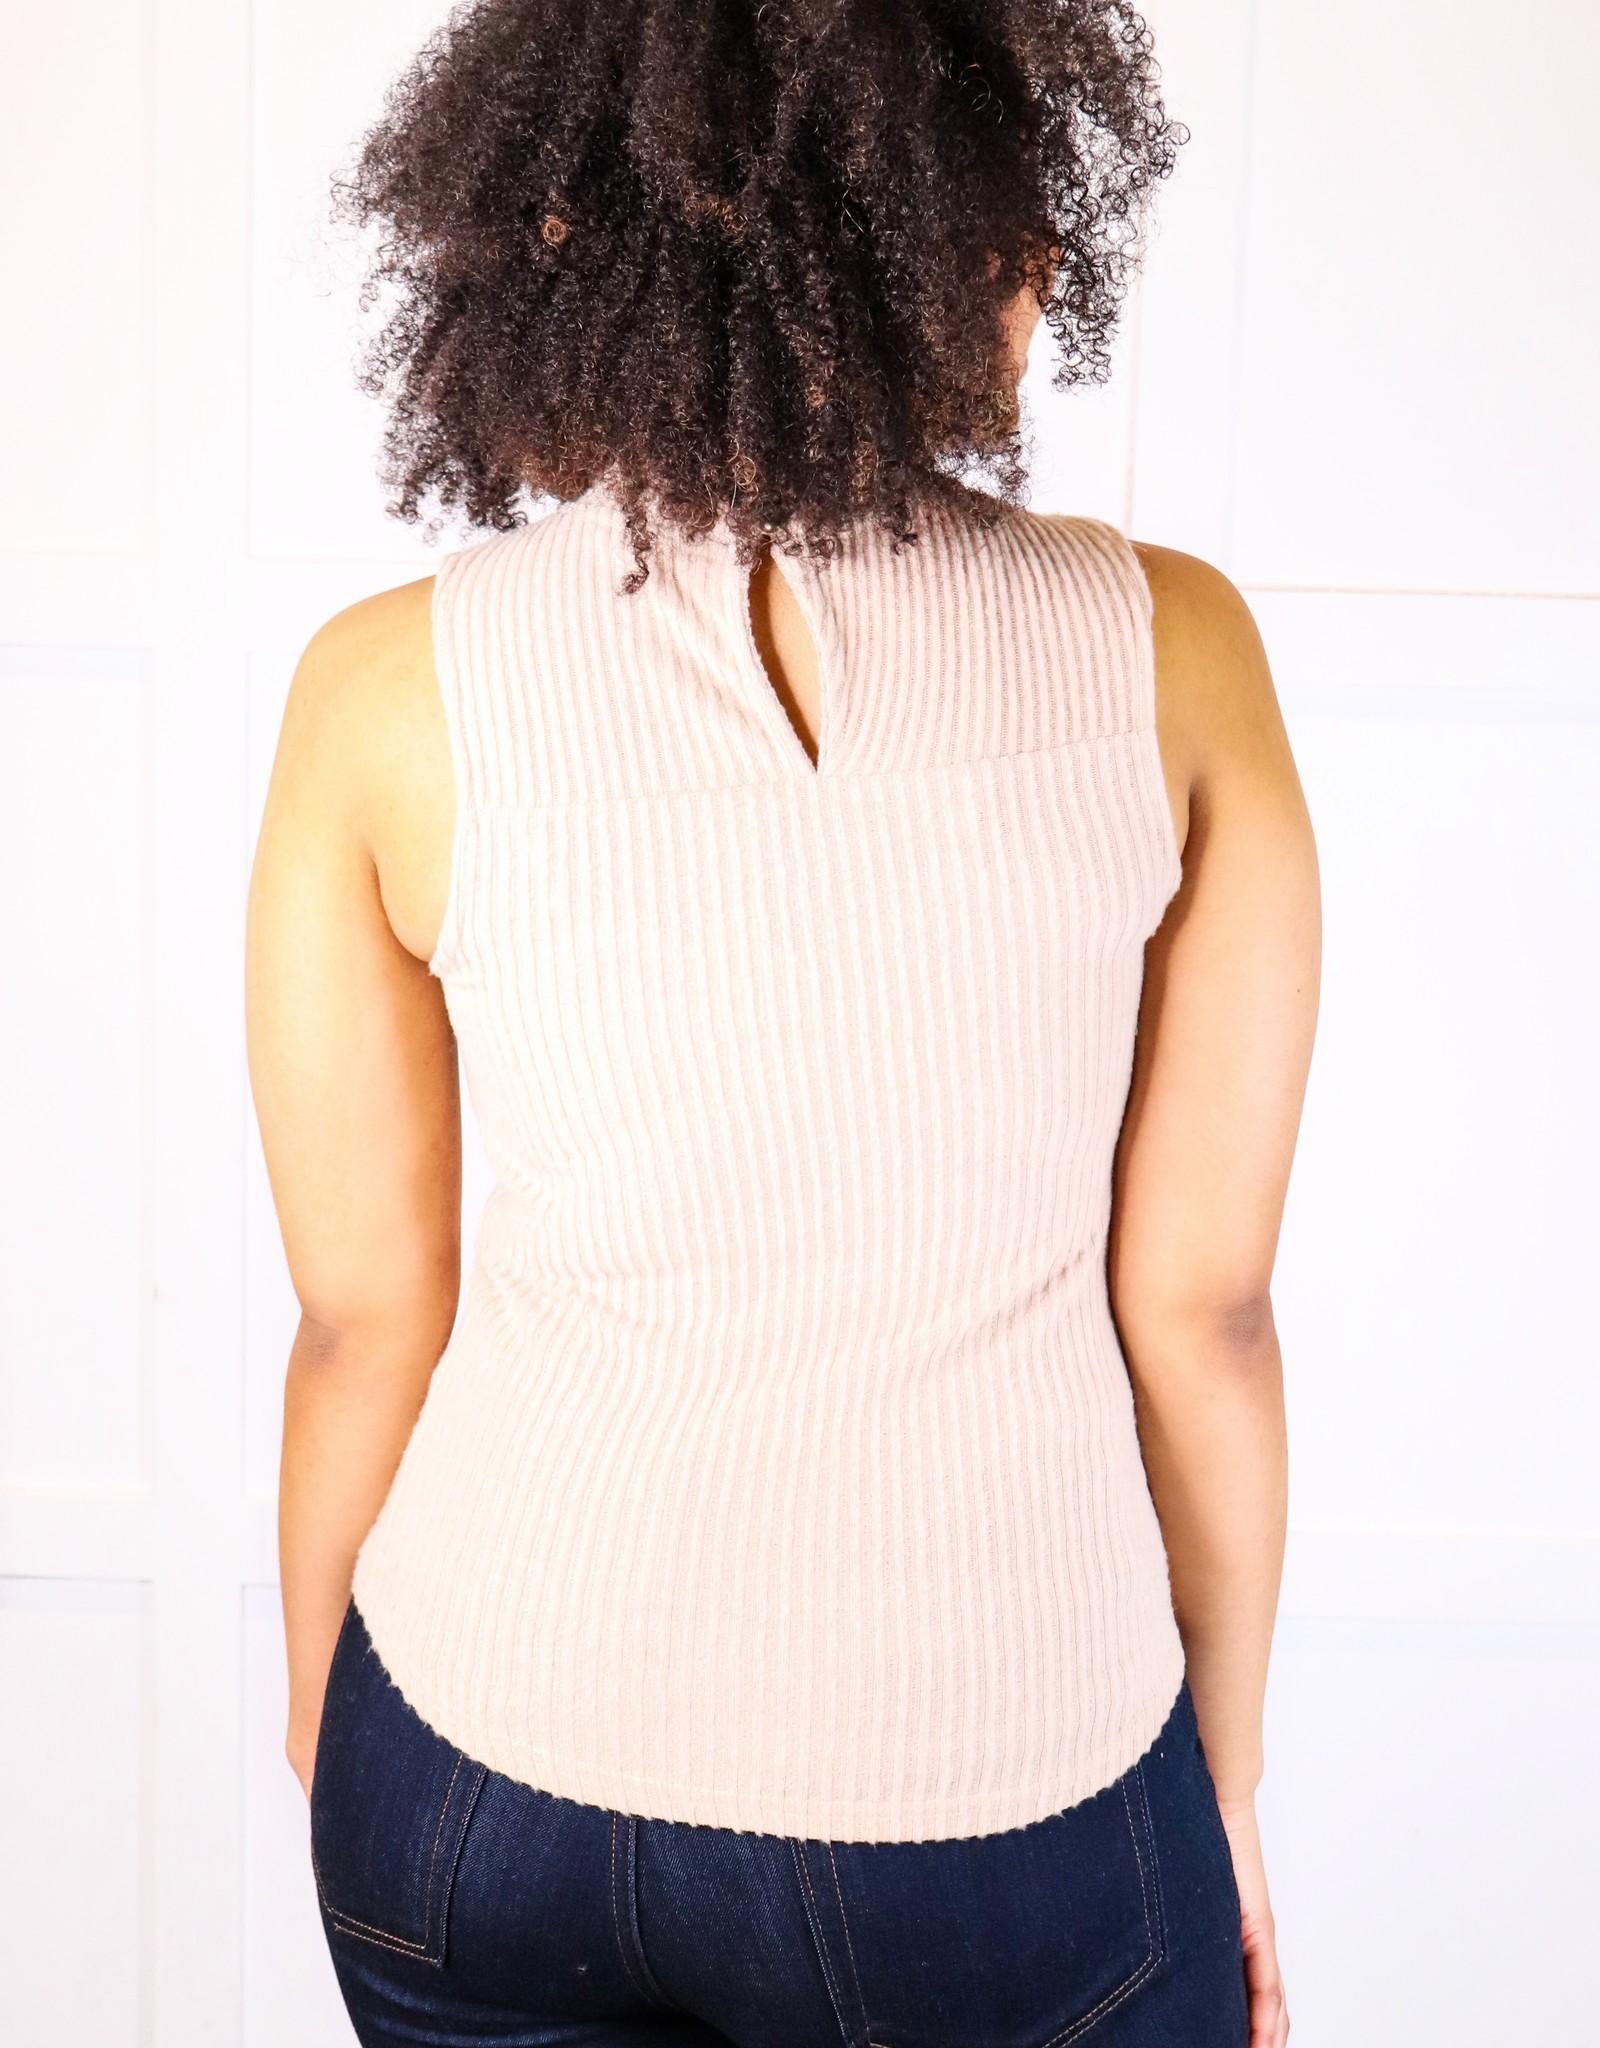 HUSH Slvless mock neck rib knit top